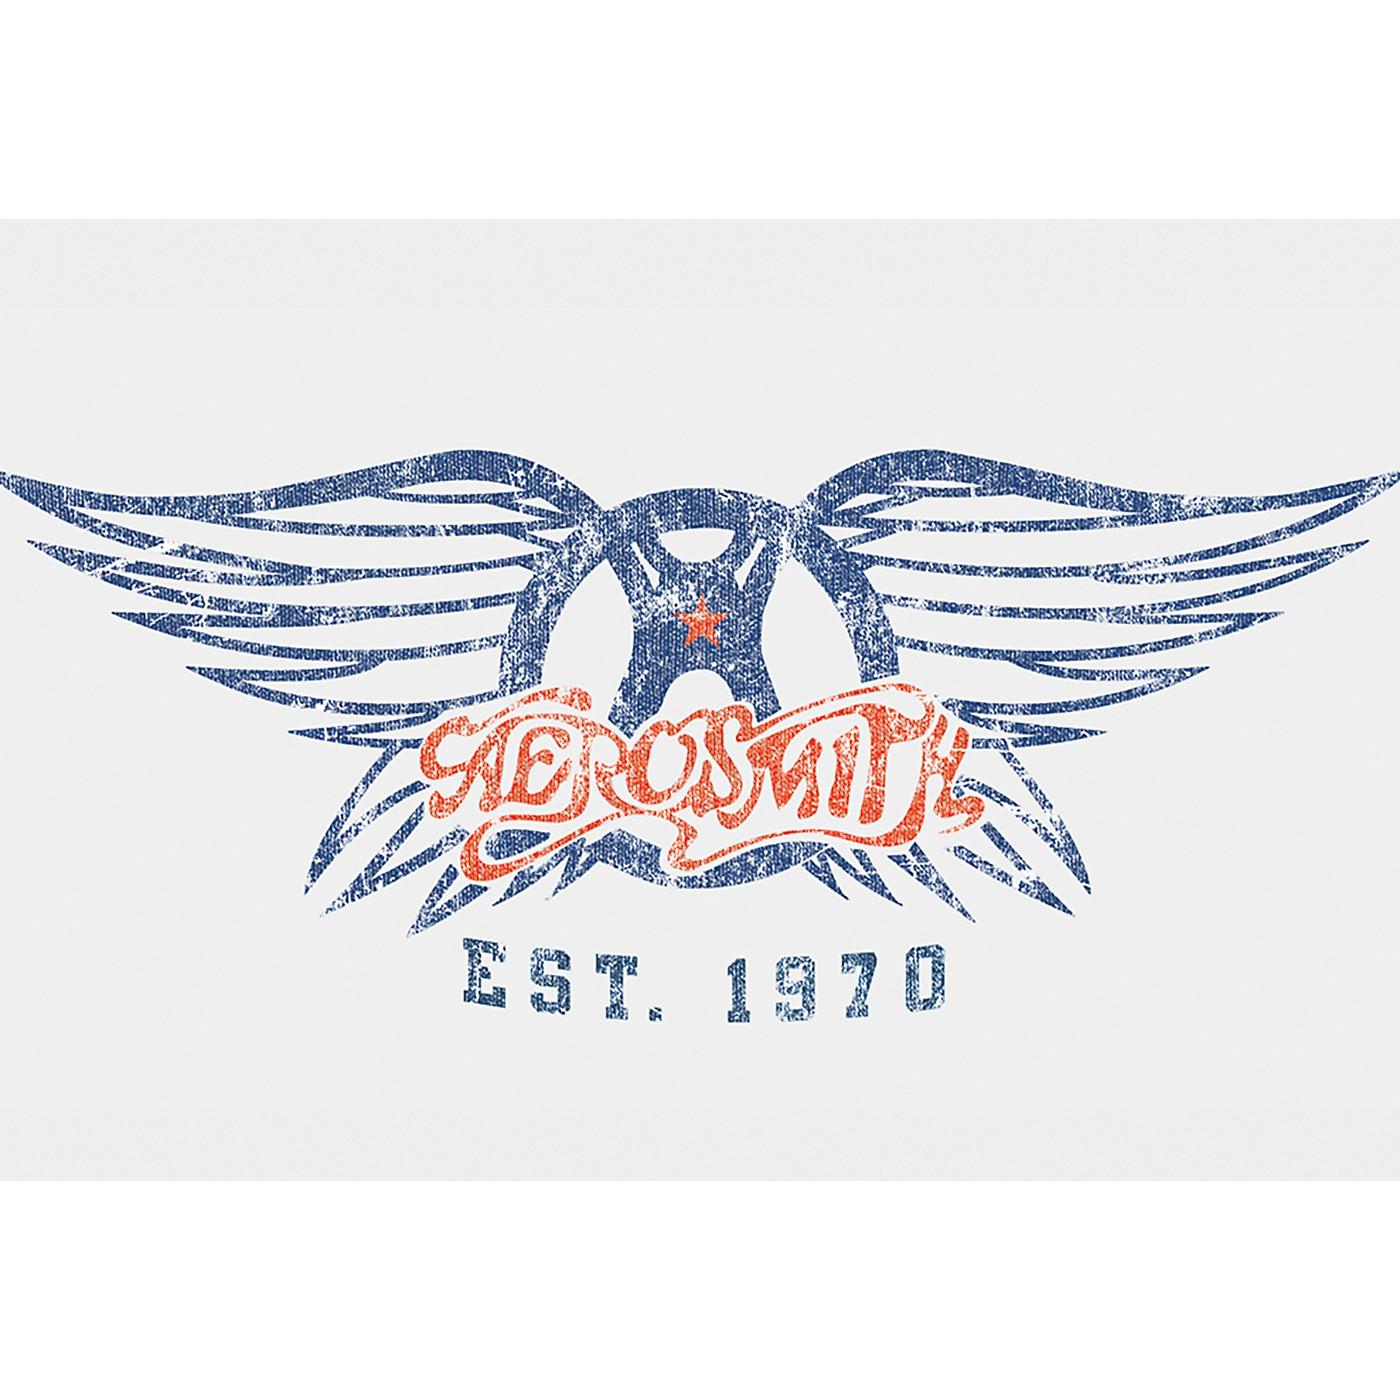 C&D Visionary Aerosmith Est. 1970 Magnet thumbnail